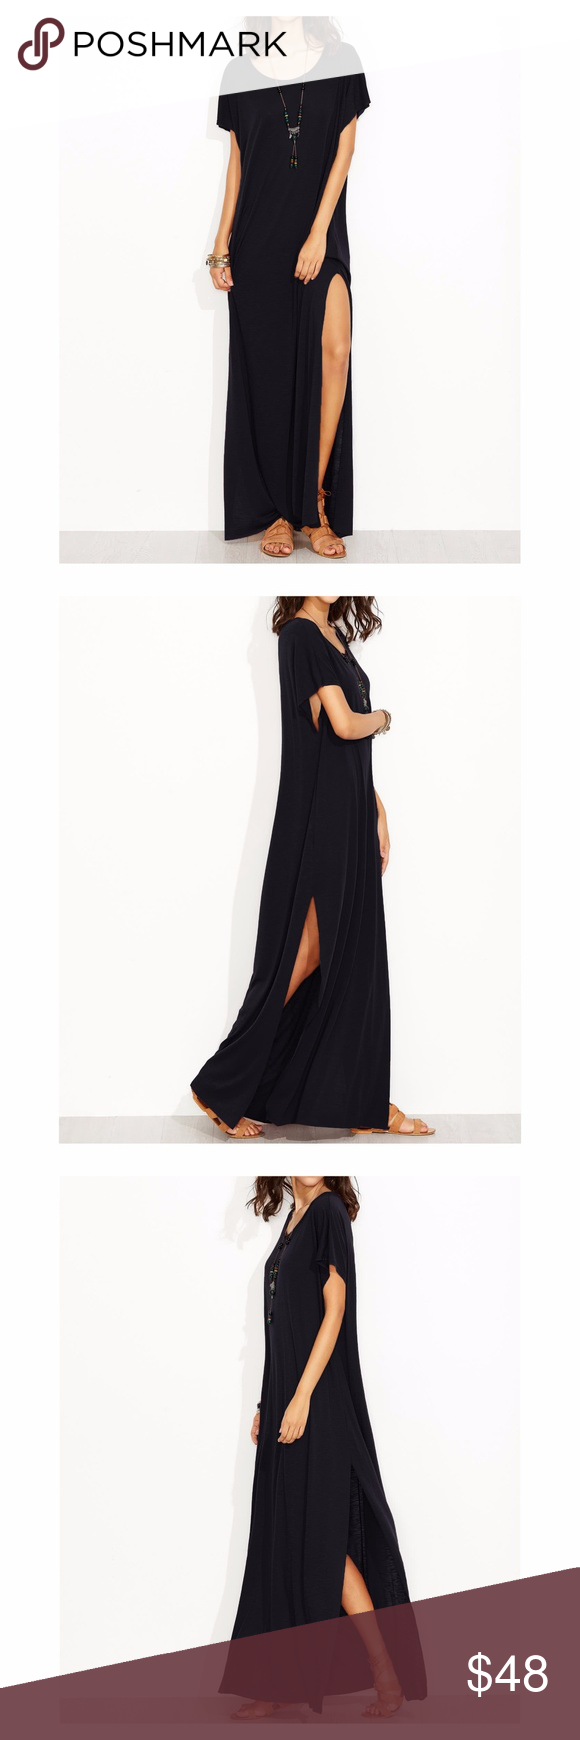 Black short sleeve oversize maxi tee shirt dress boutique